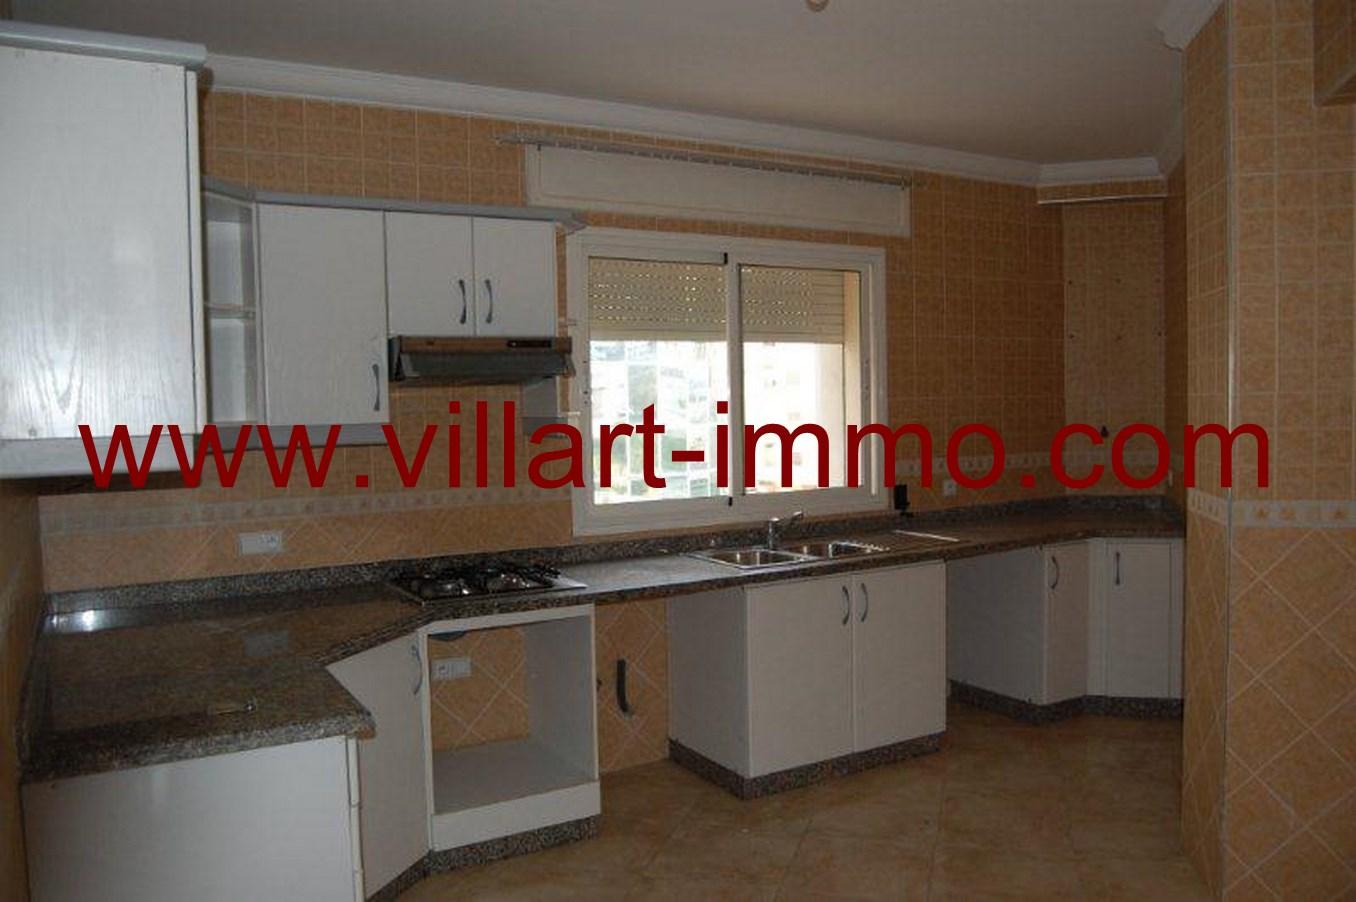 6-location-appartement-non-meuble-tanger-cuisine-l623-villart-immo